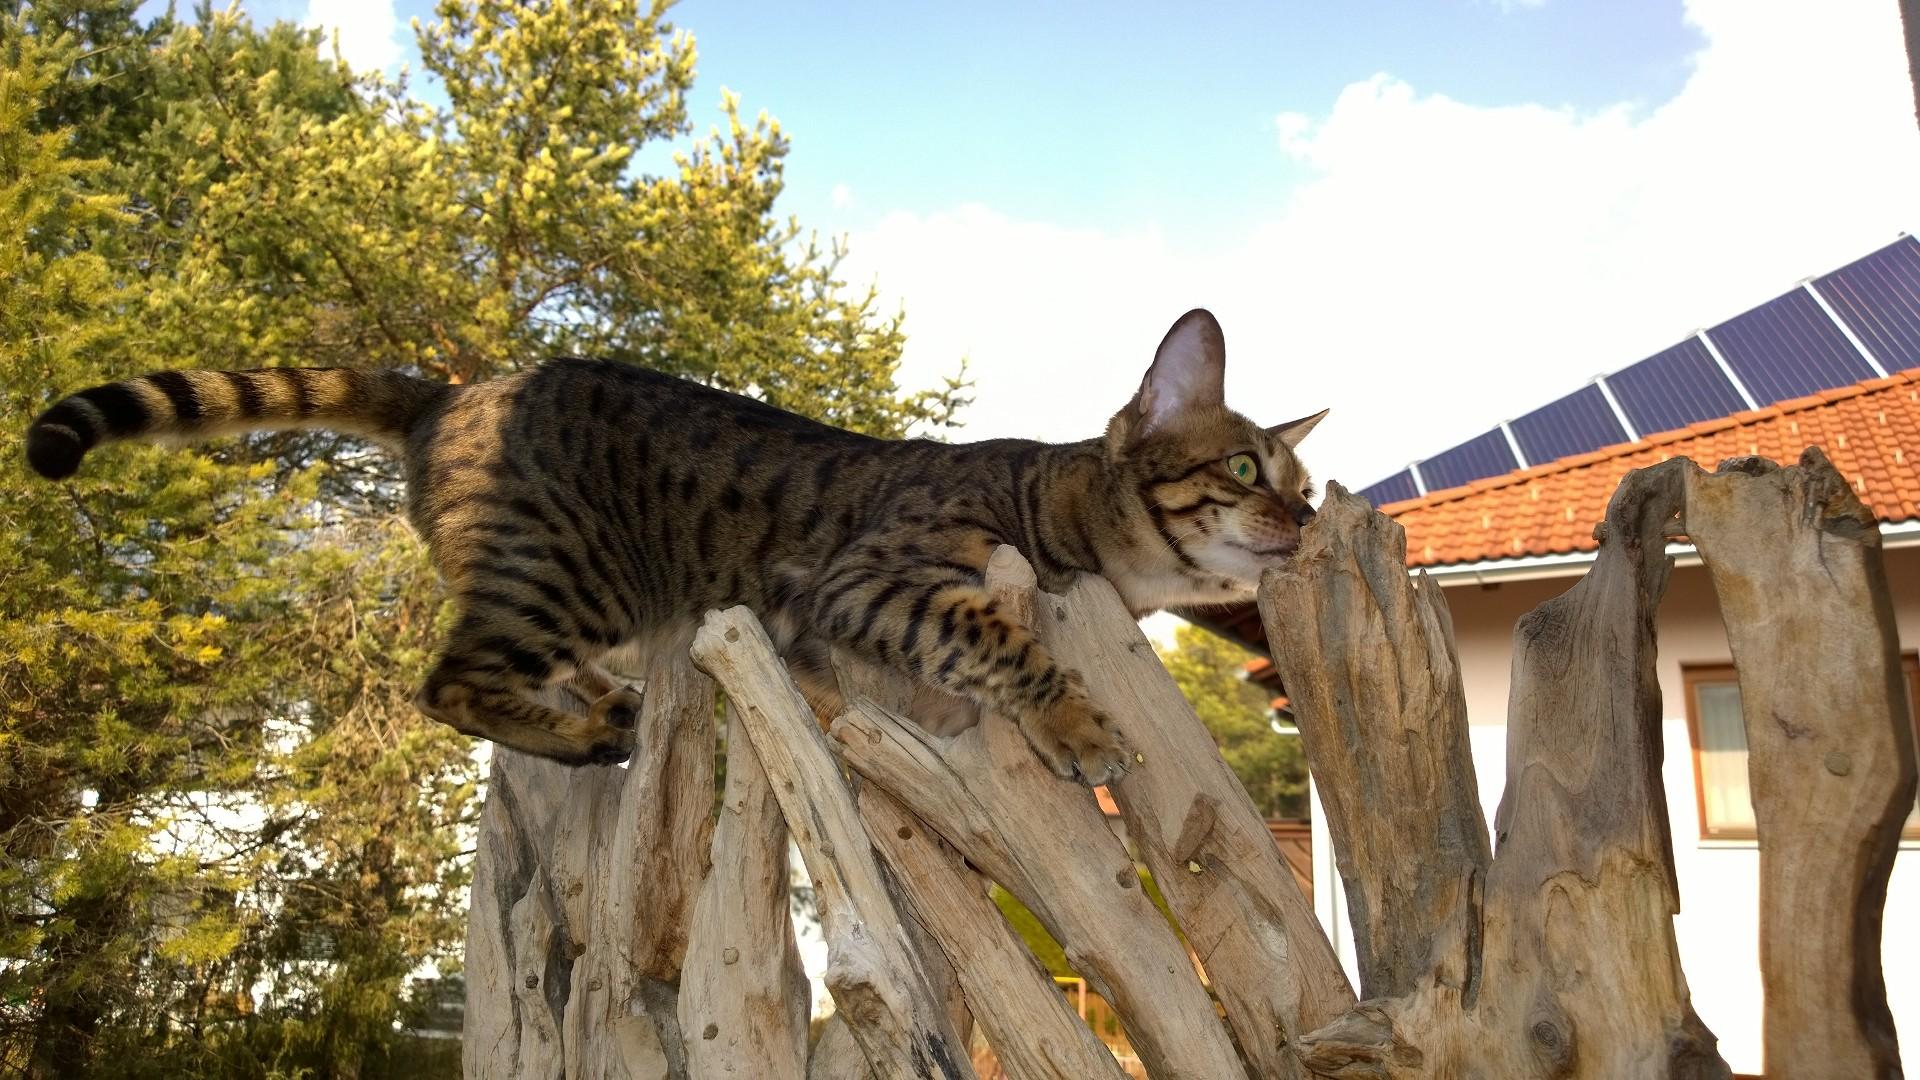 Fischis Panthy Savannah Cat